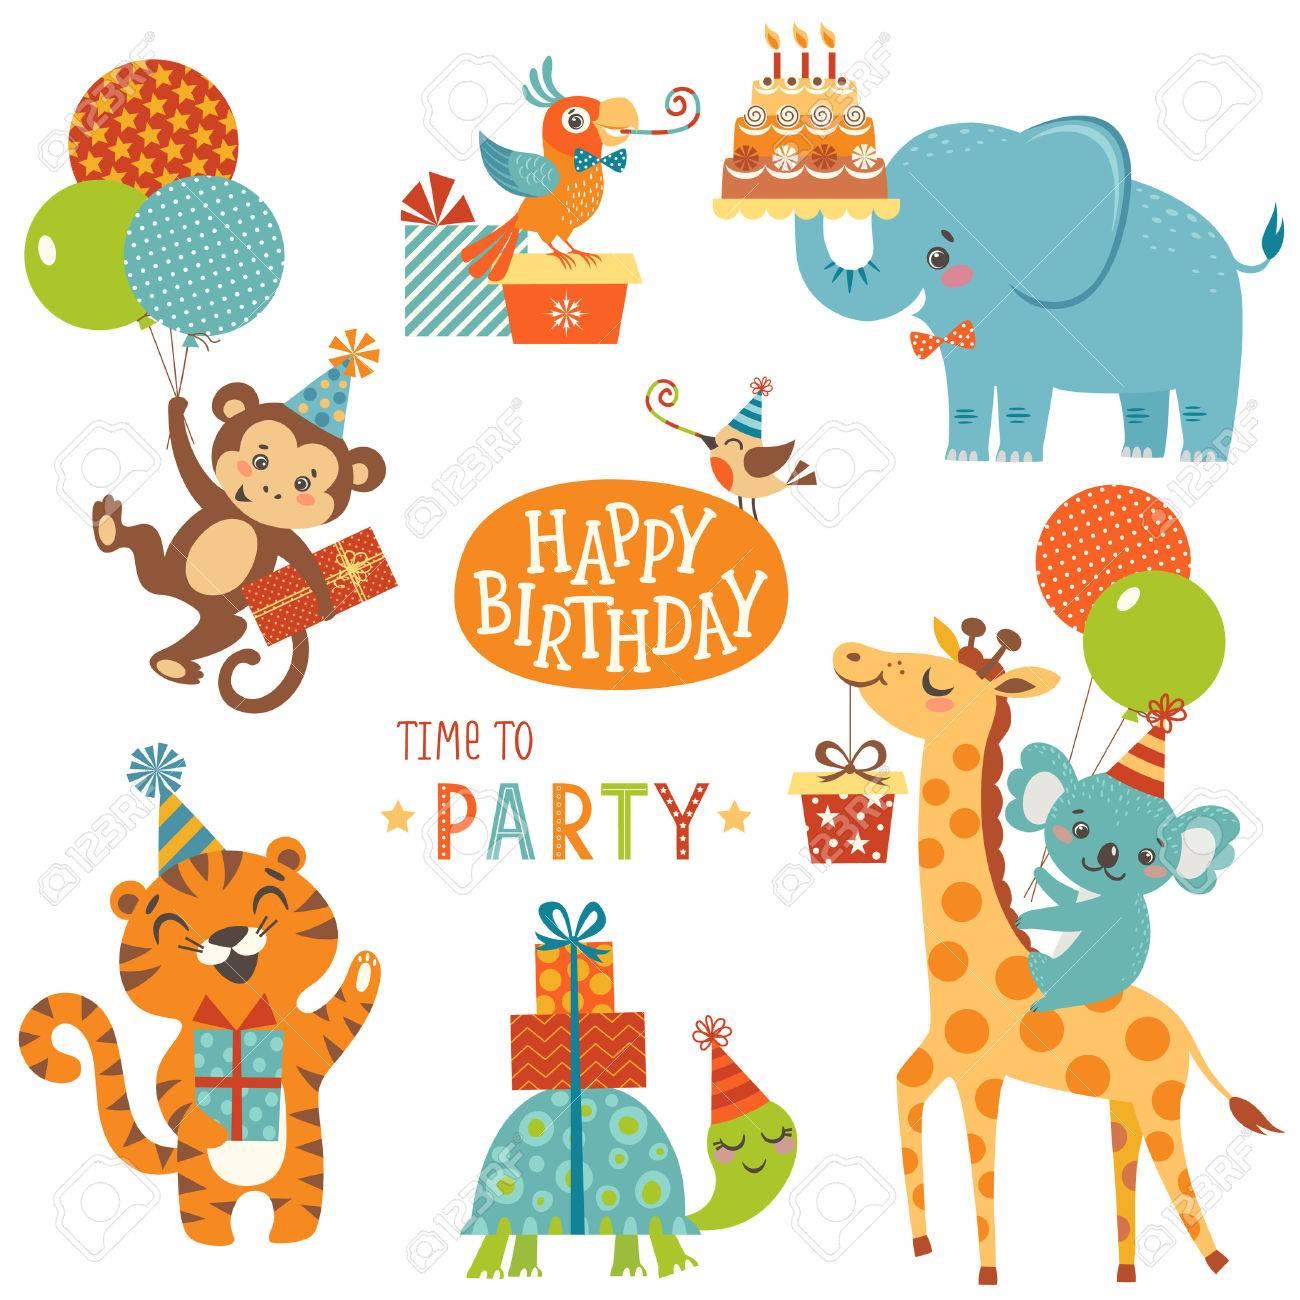 Set of cute animals for happy birthday design - 59196453